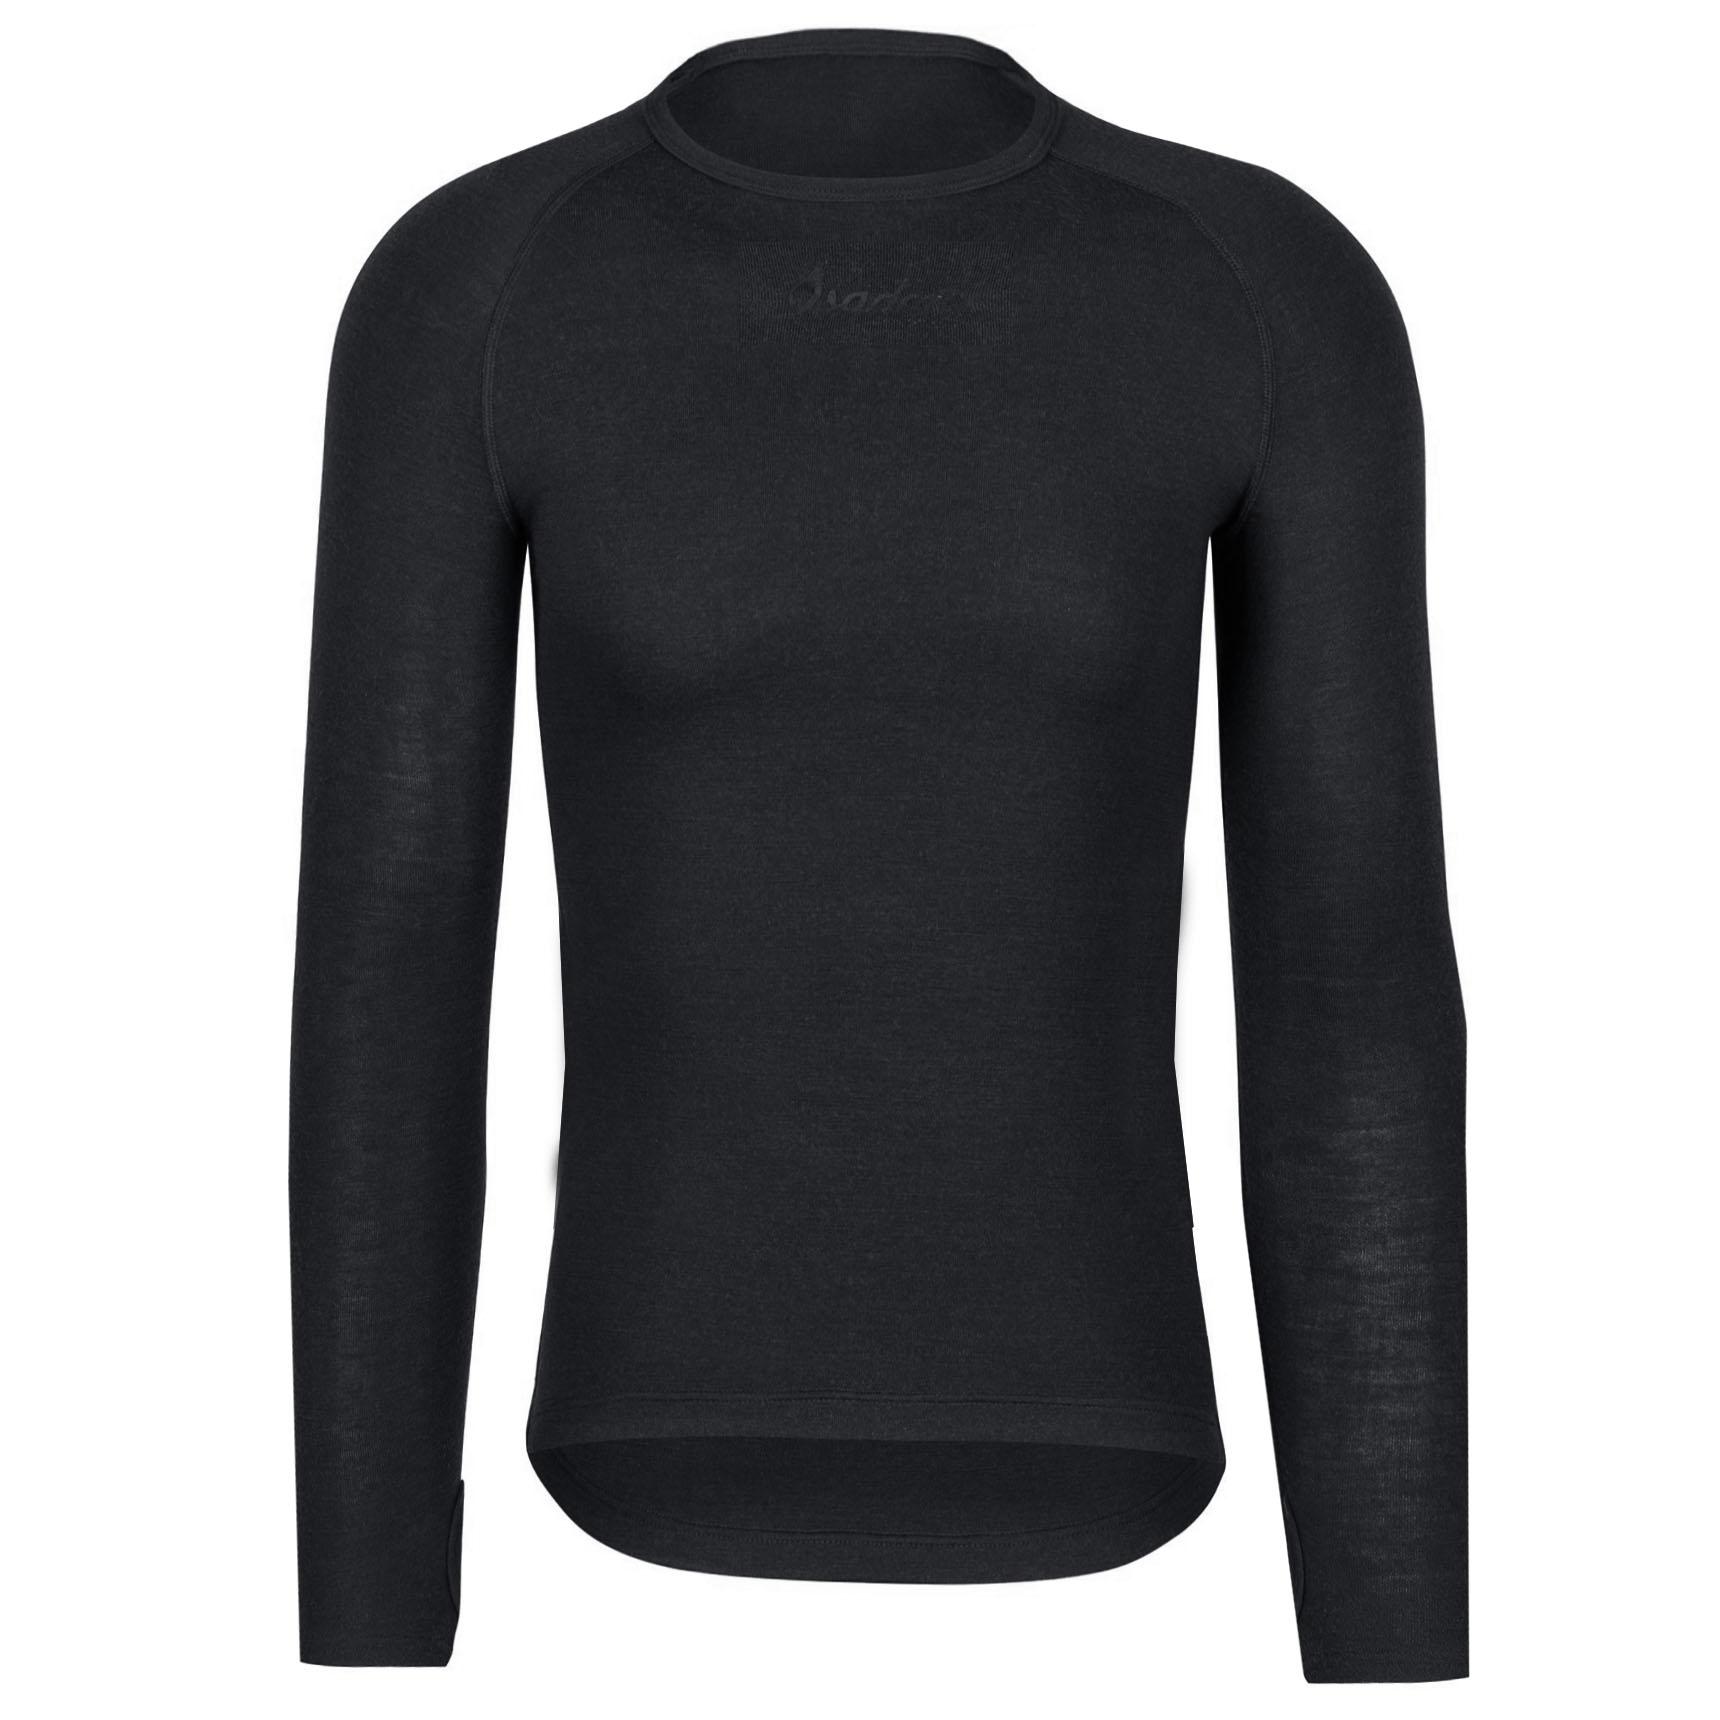 Isadore 100% Merino Langarm-Baselayer - Black